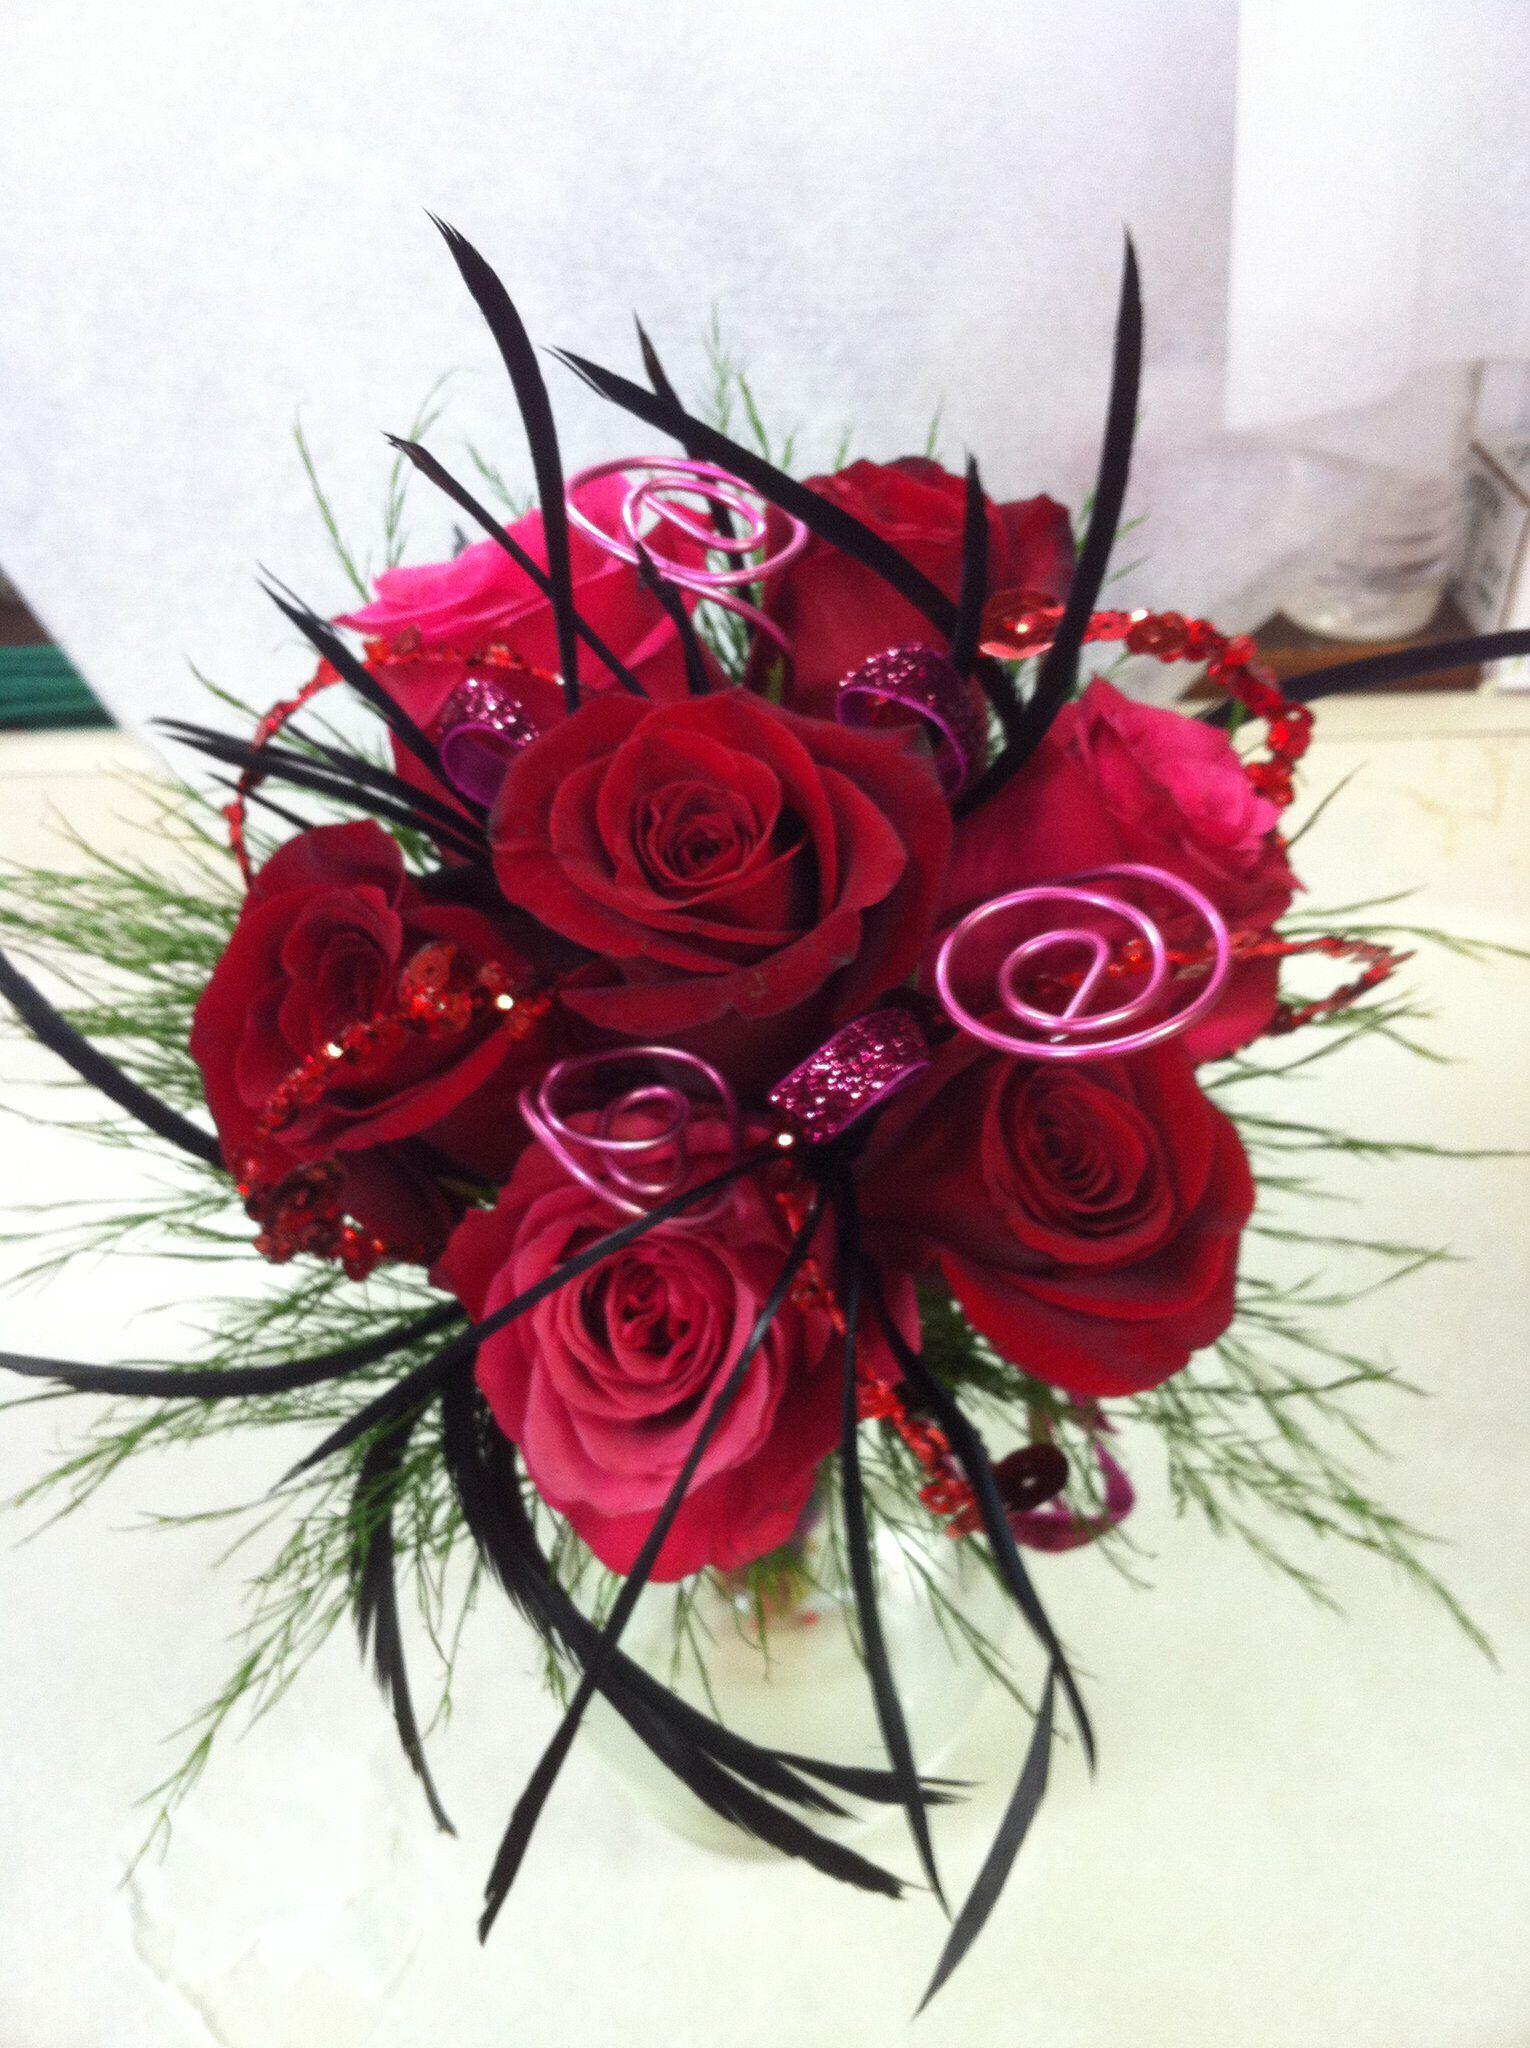 Perfect Rose Garden Florist   Paducah Kentucky Roses Feathers Black Pink Homecoming  Prom Handheld Images